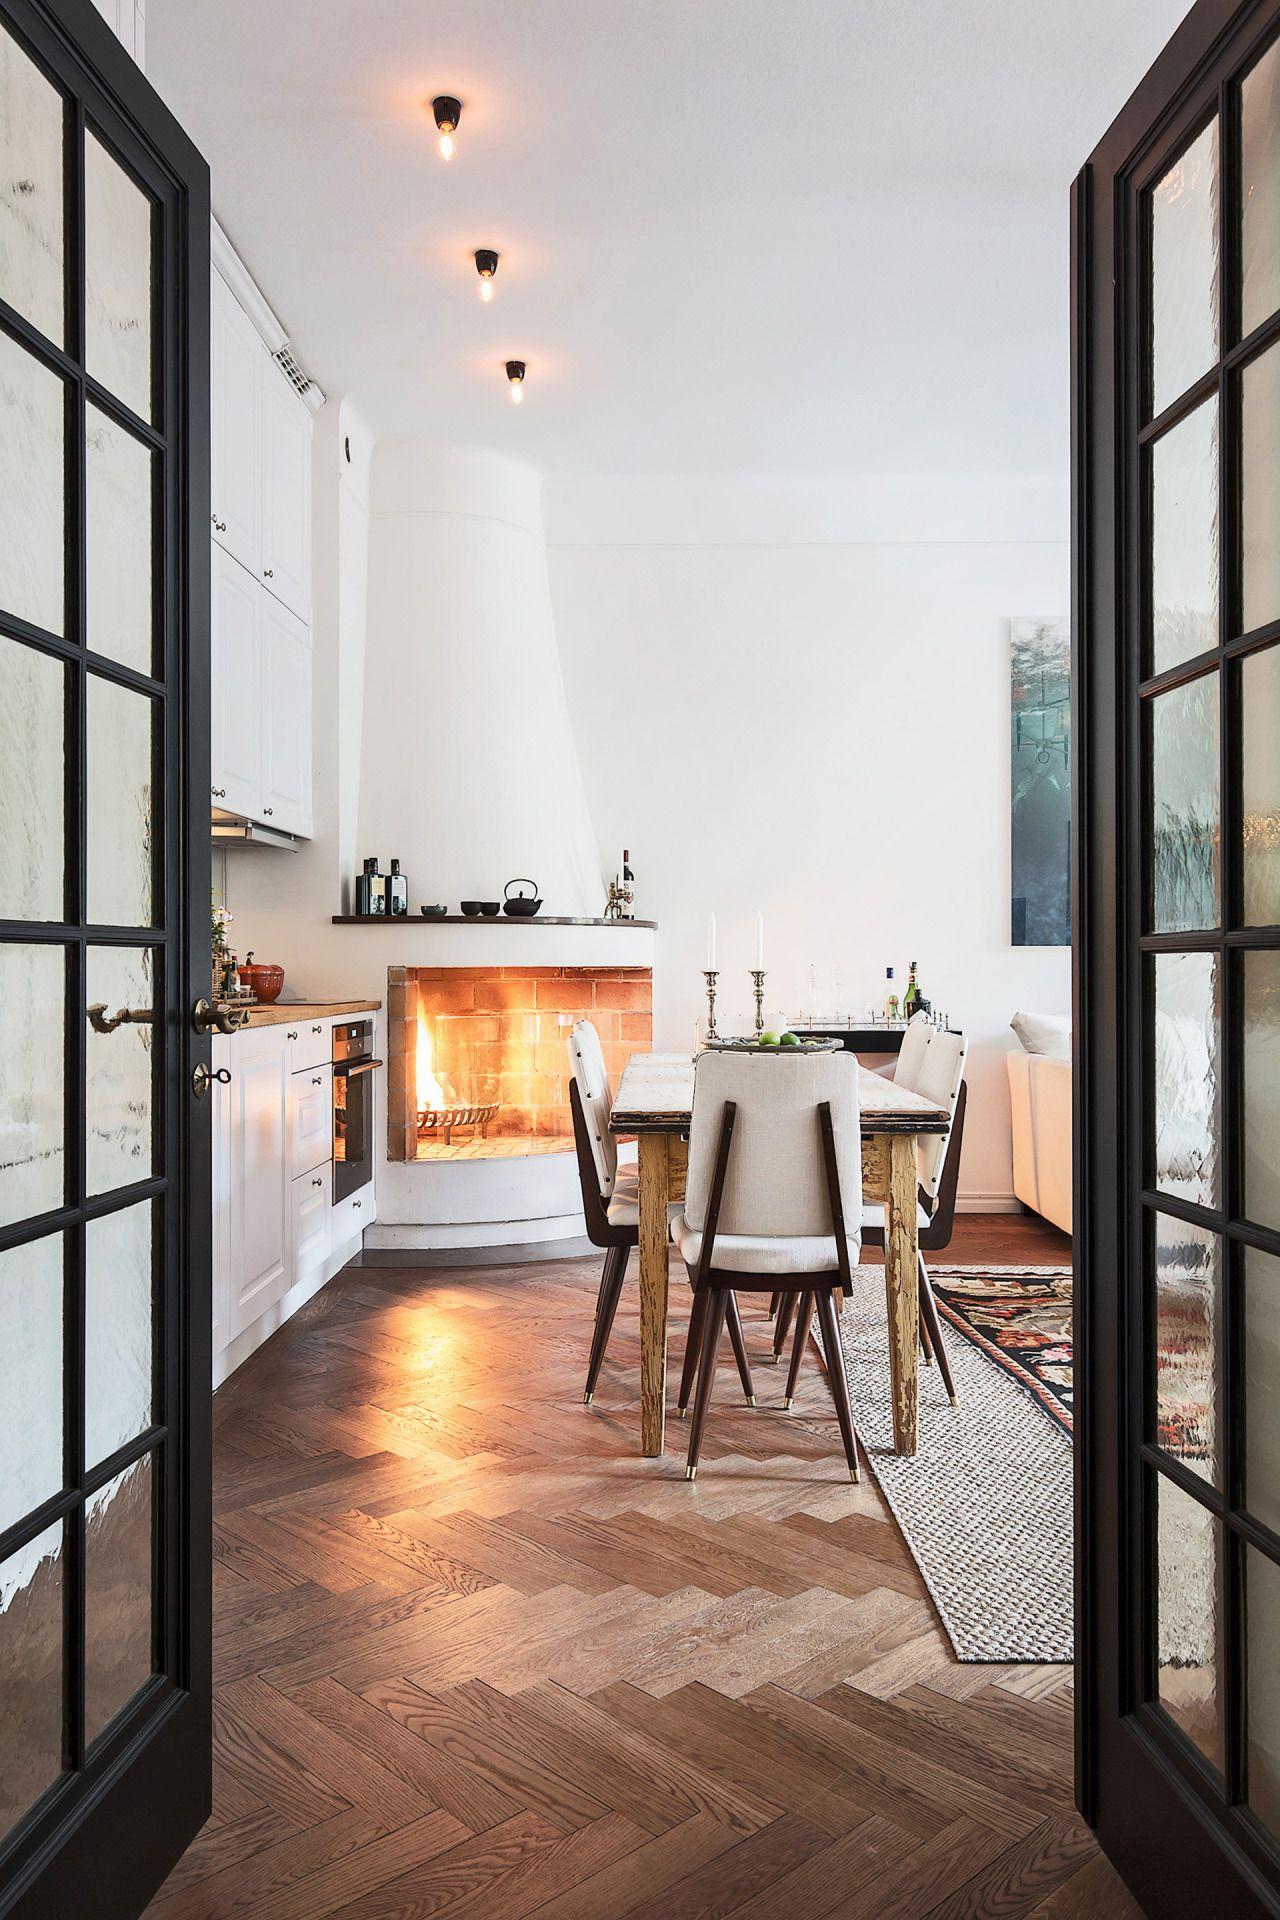 Gravity Home | Favorite Home Tours | Pinterest | Cocina comedor ...